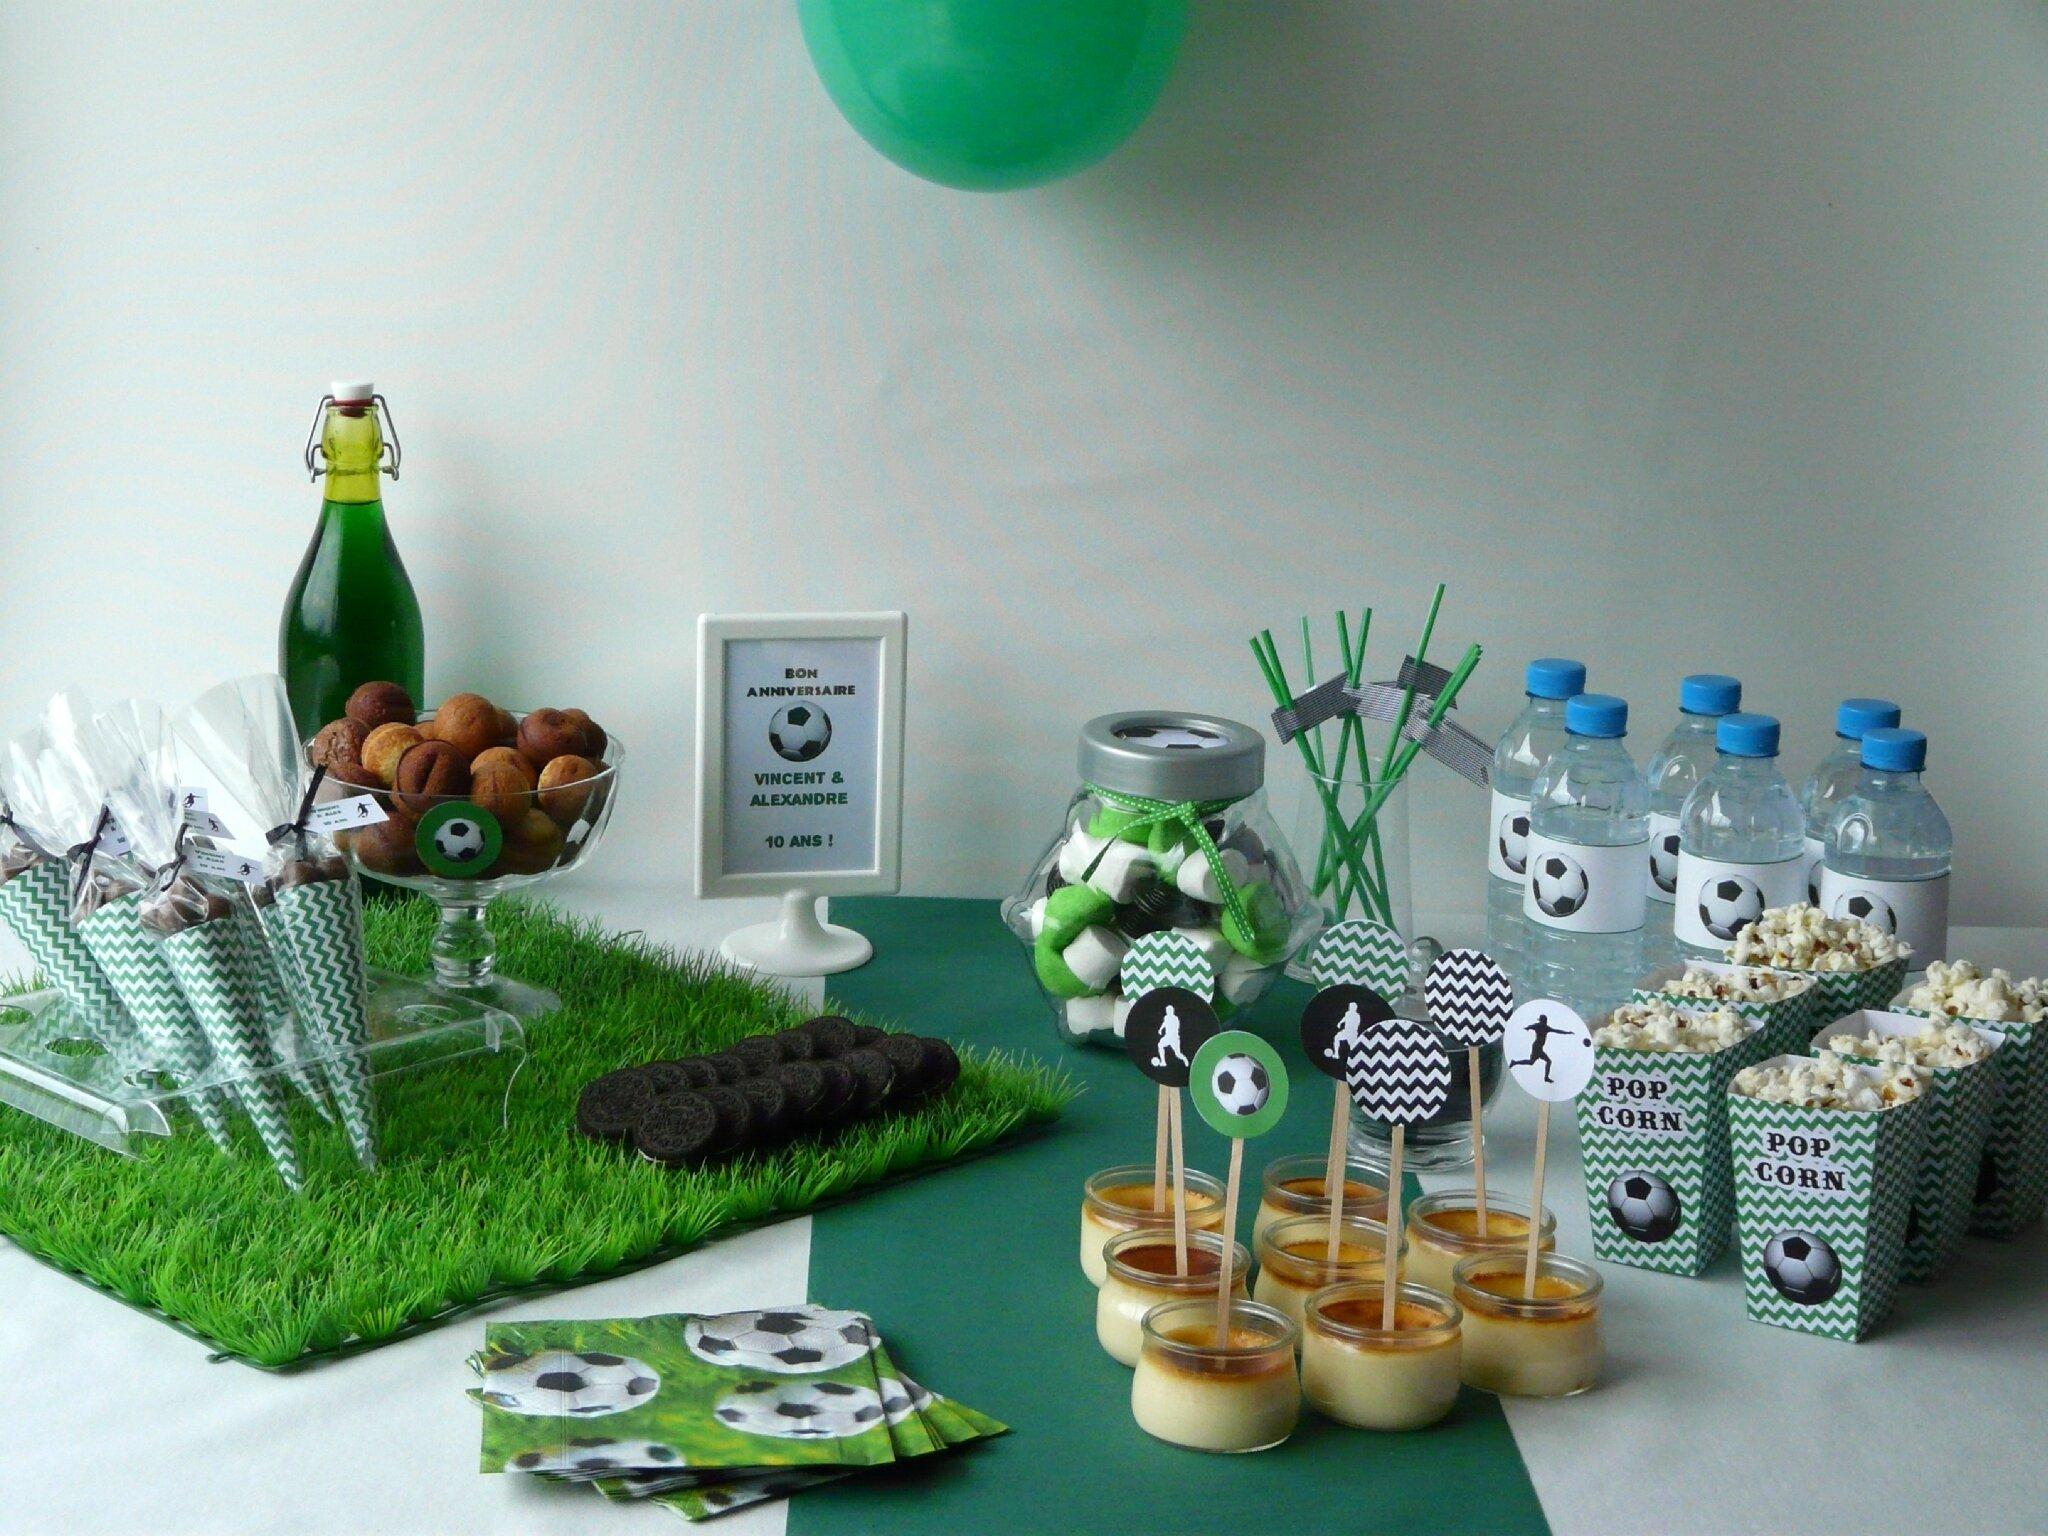 Deco anniversaire foot id e inspirante pour la conception de la maison - Decoration anniversaire football ...